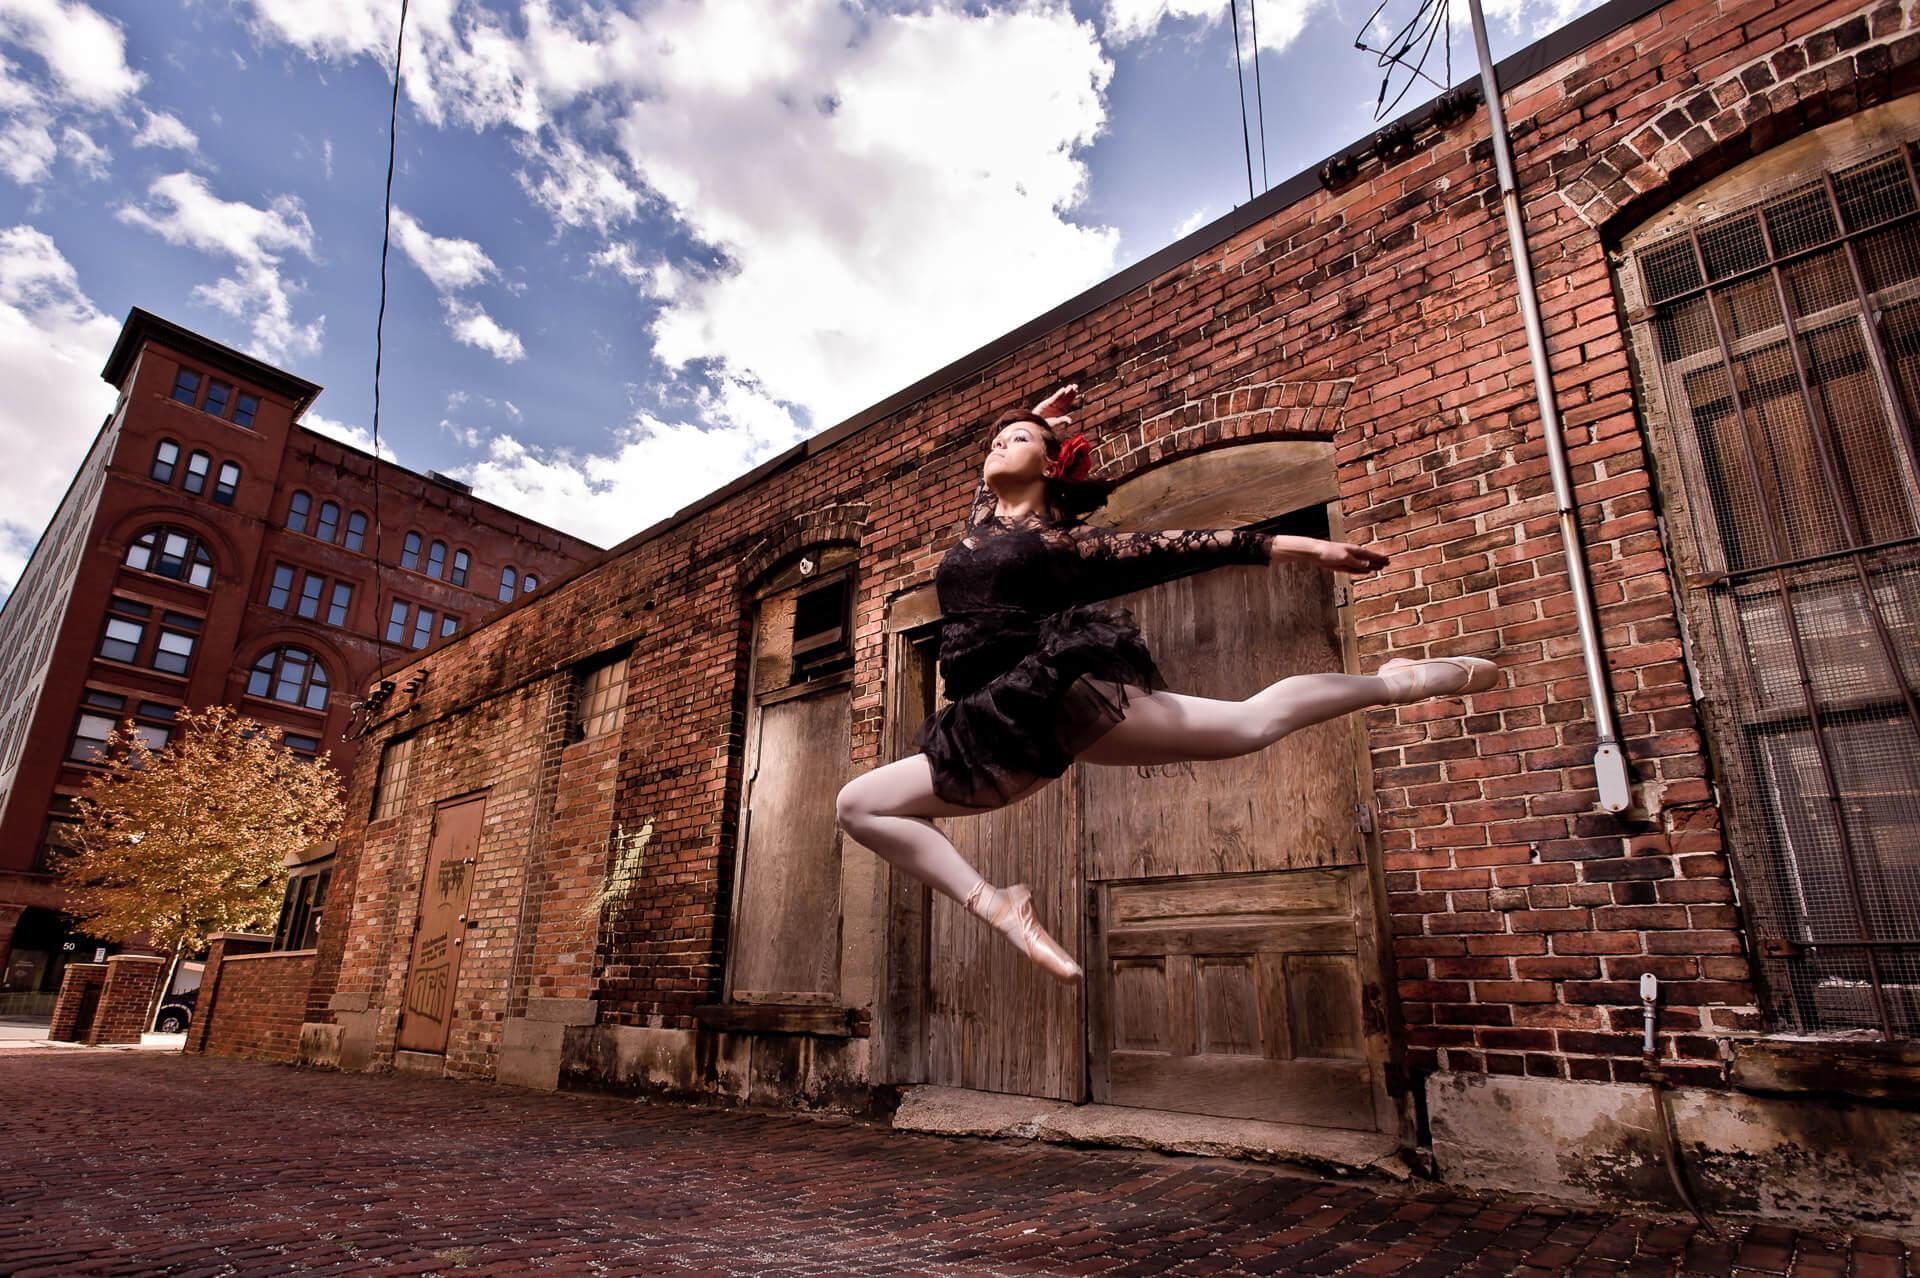 High school ballerina leaps in downtown Grand Rapids senior portrait photography